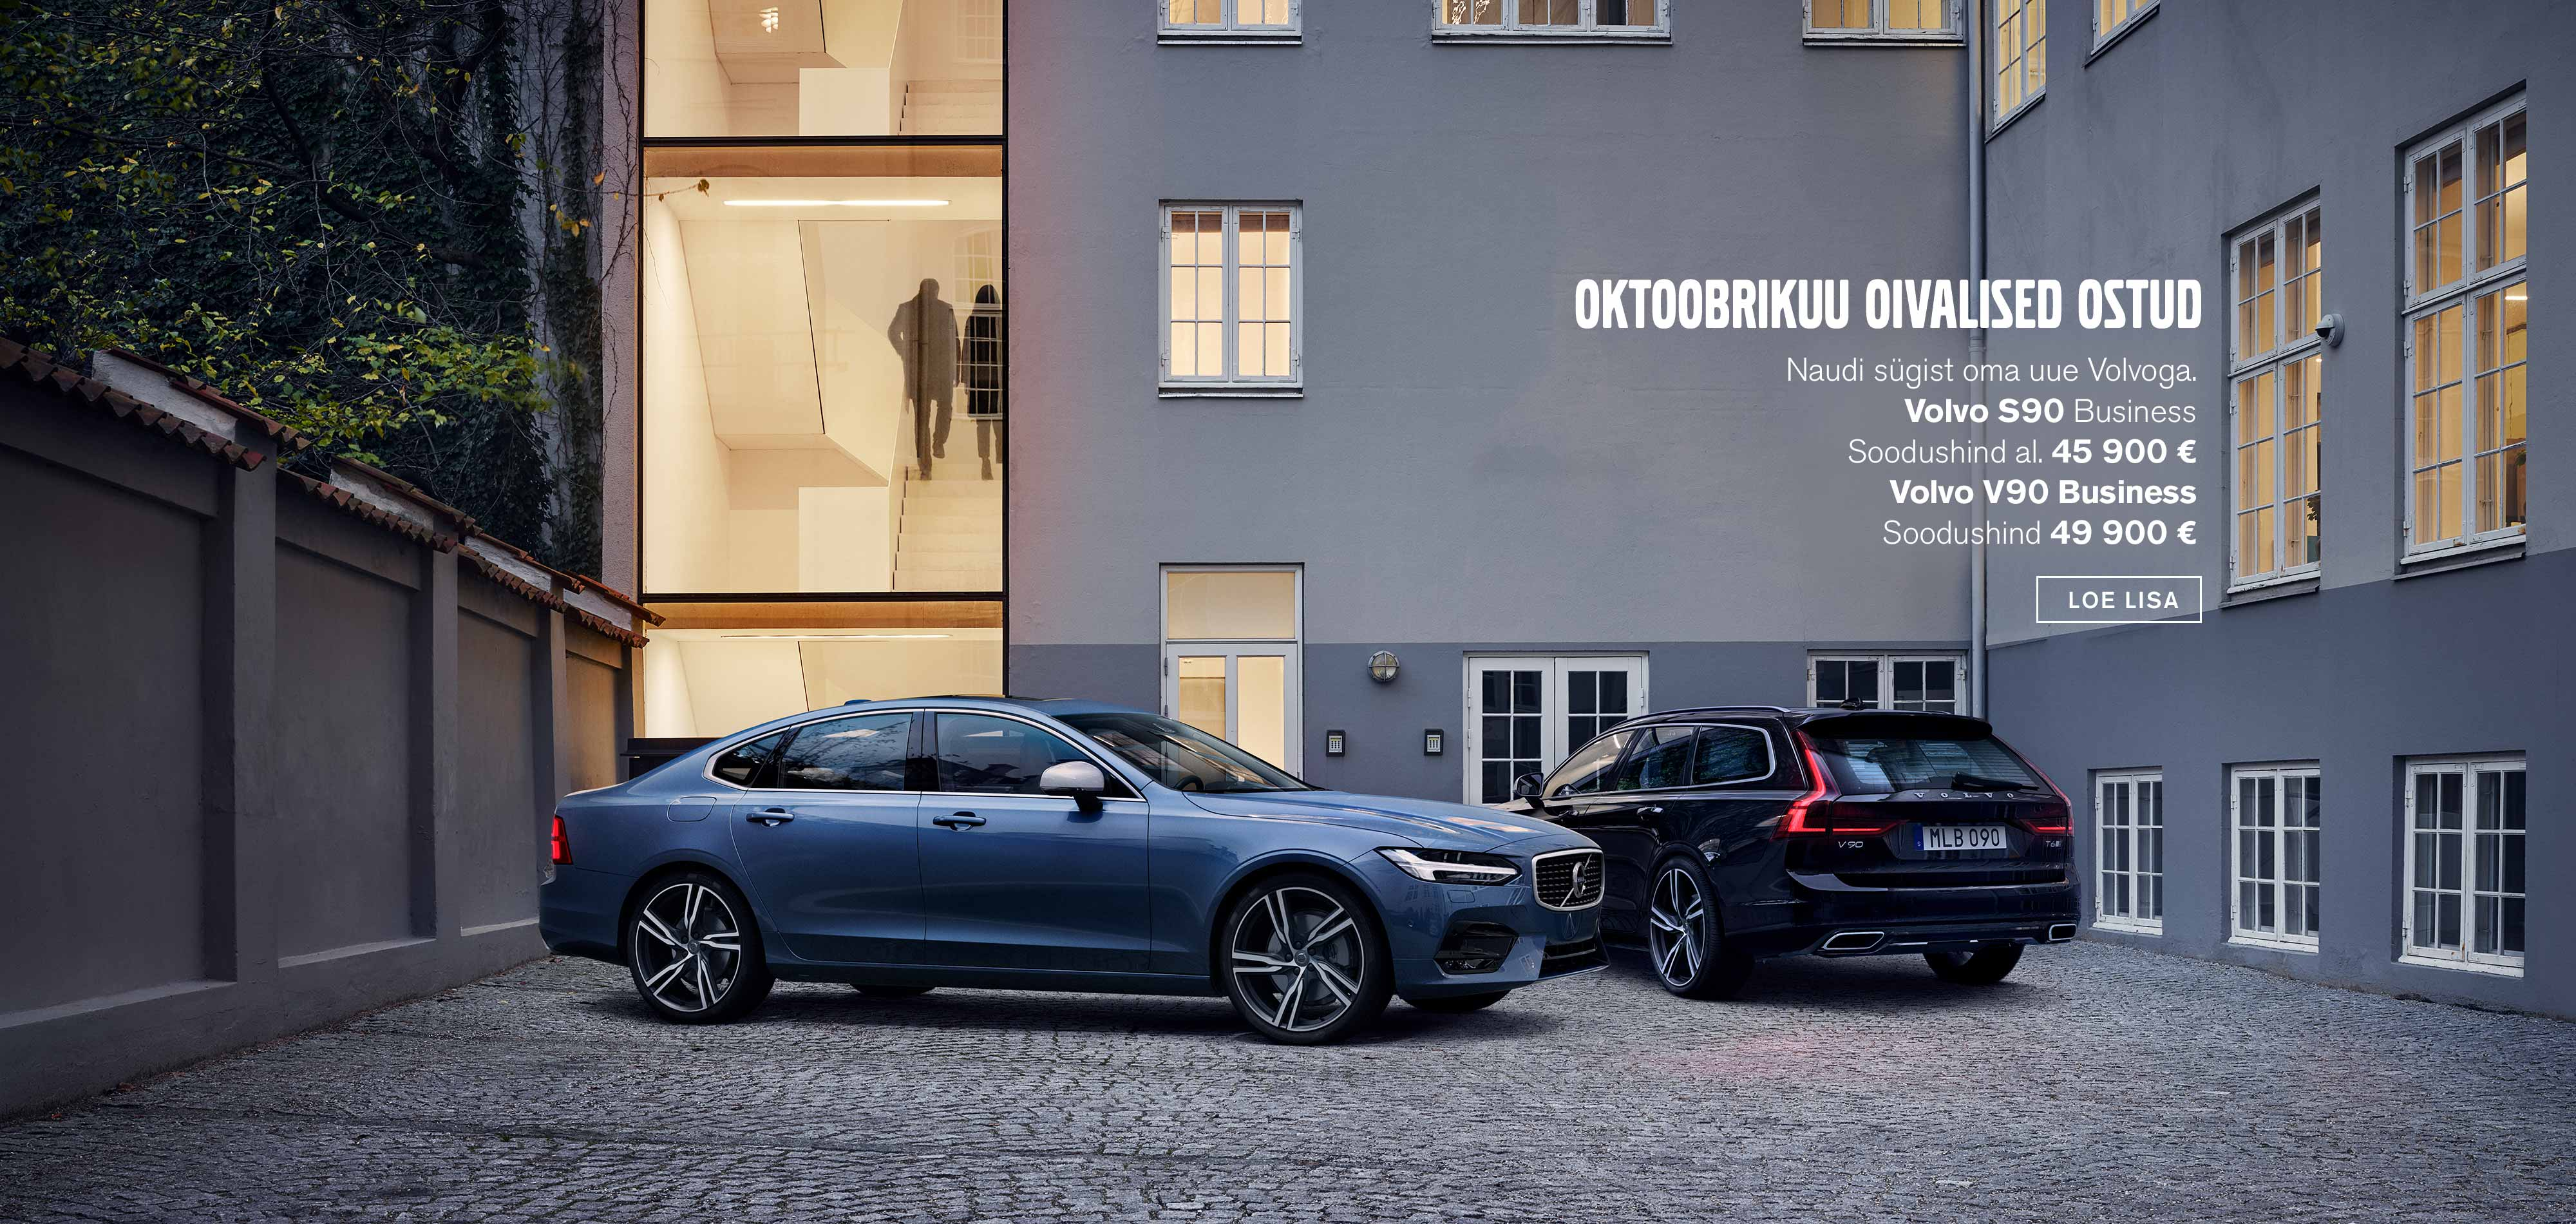 Volvo S90 ja V90 Business erimudelid